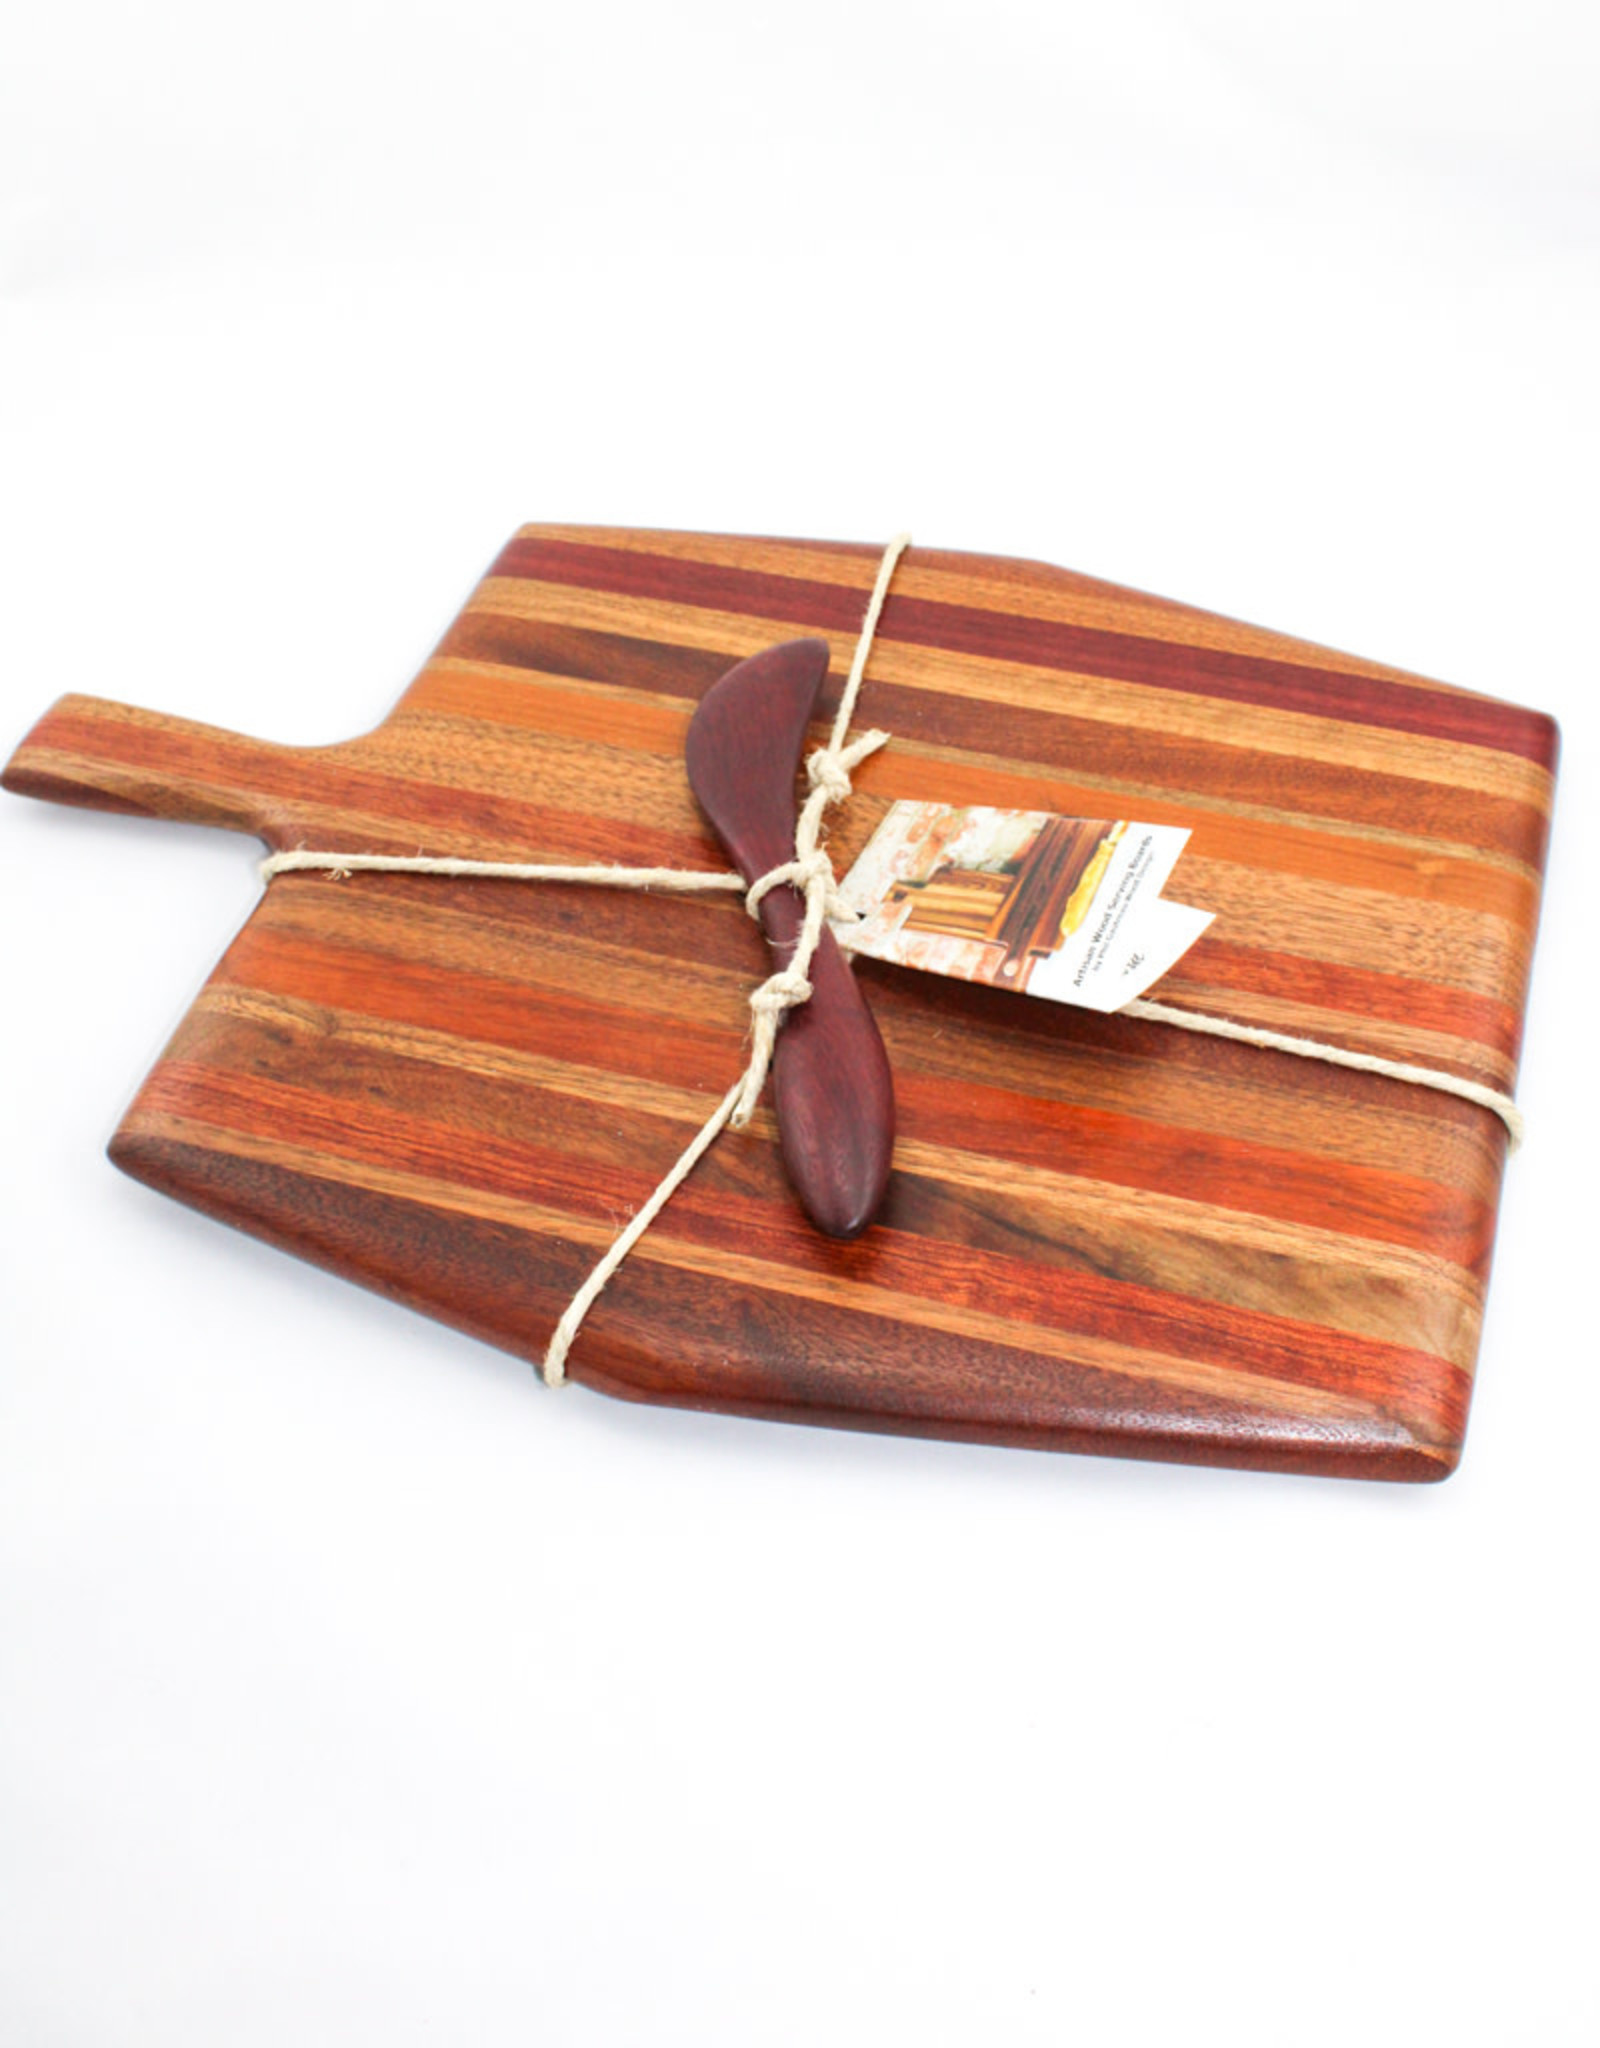 Phil Gautreau Wood Design 16'' Serving Board